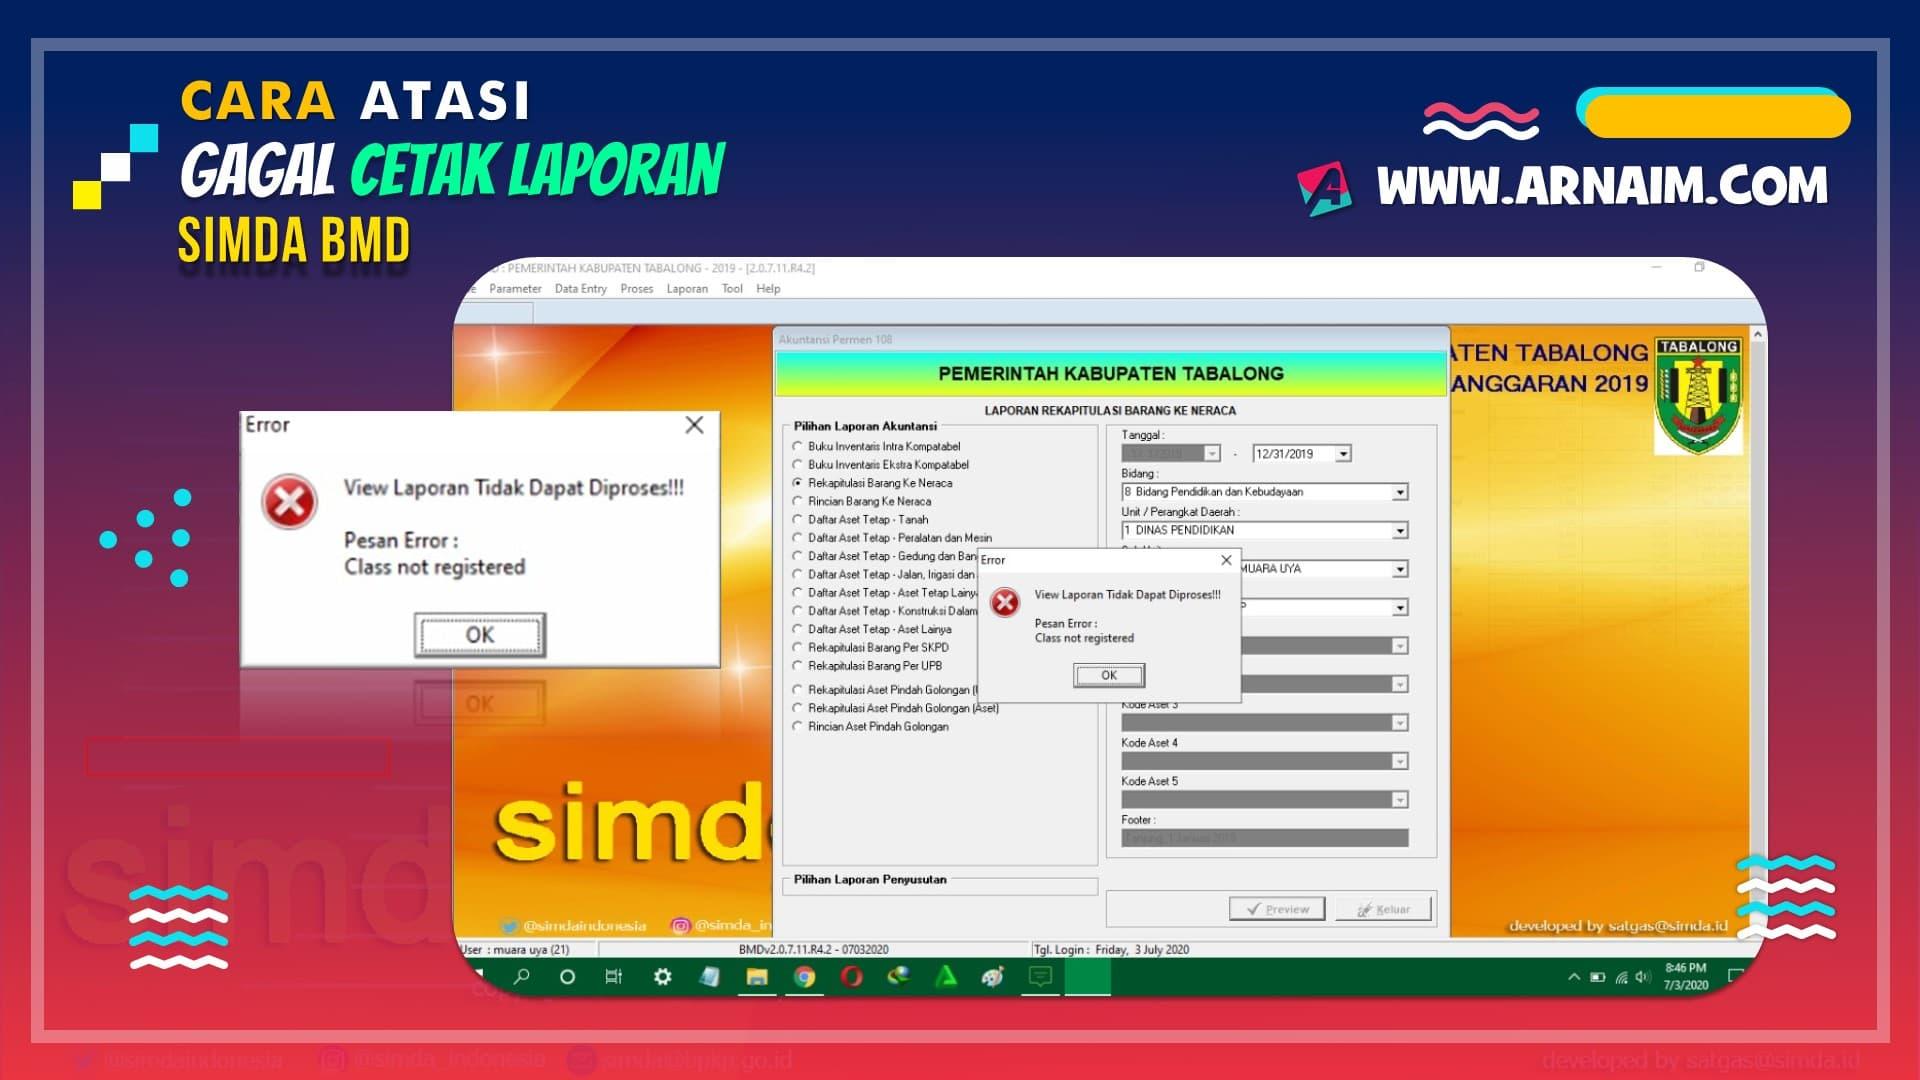 ARNAIM.COM - CARA ATASI GAGAL CETAK LAPORAN SIMDA BMD (2)